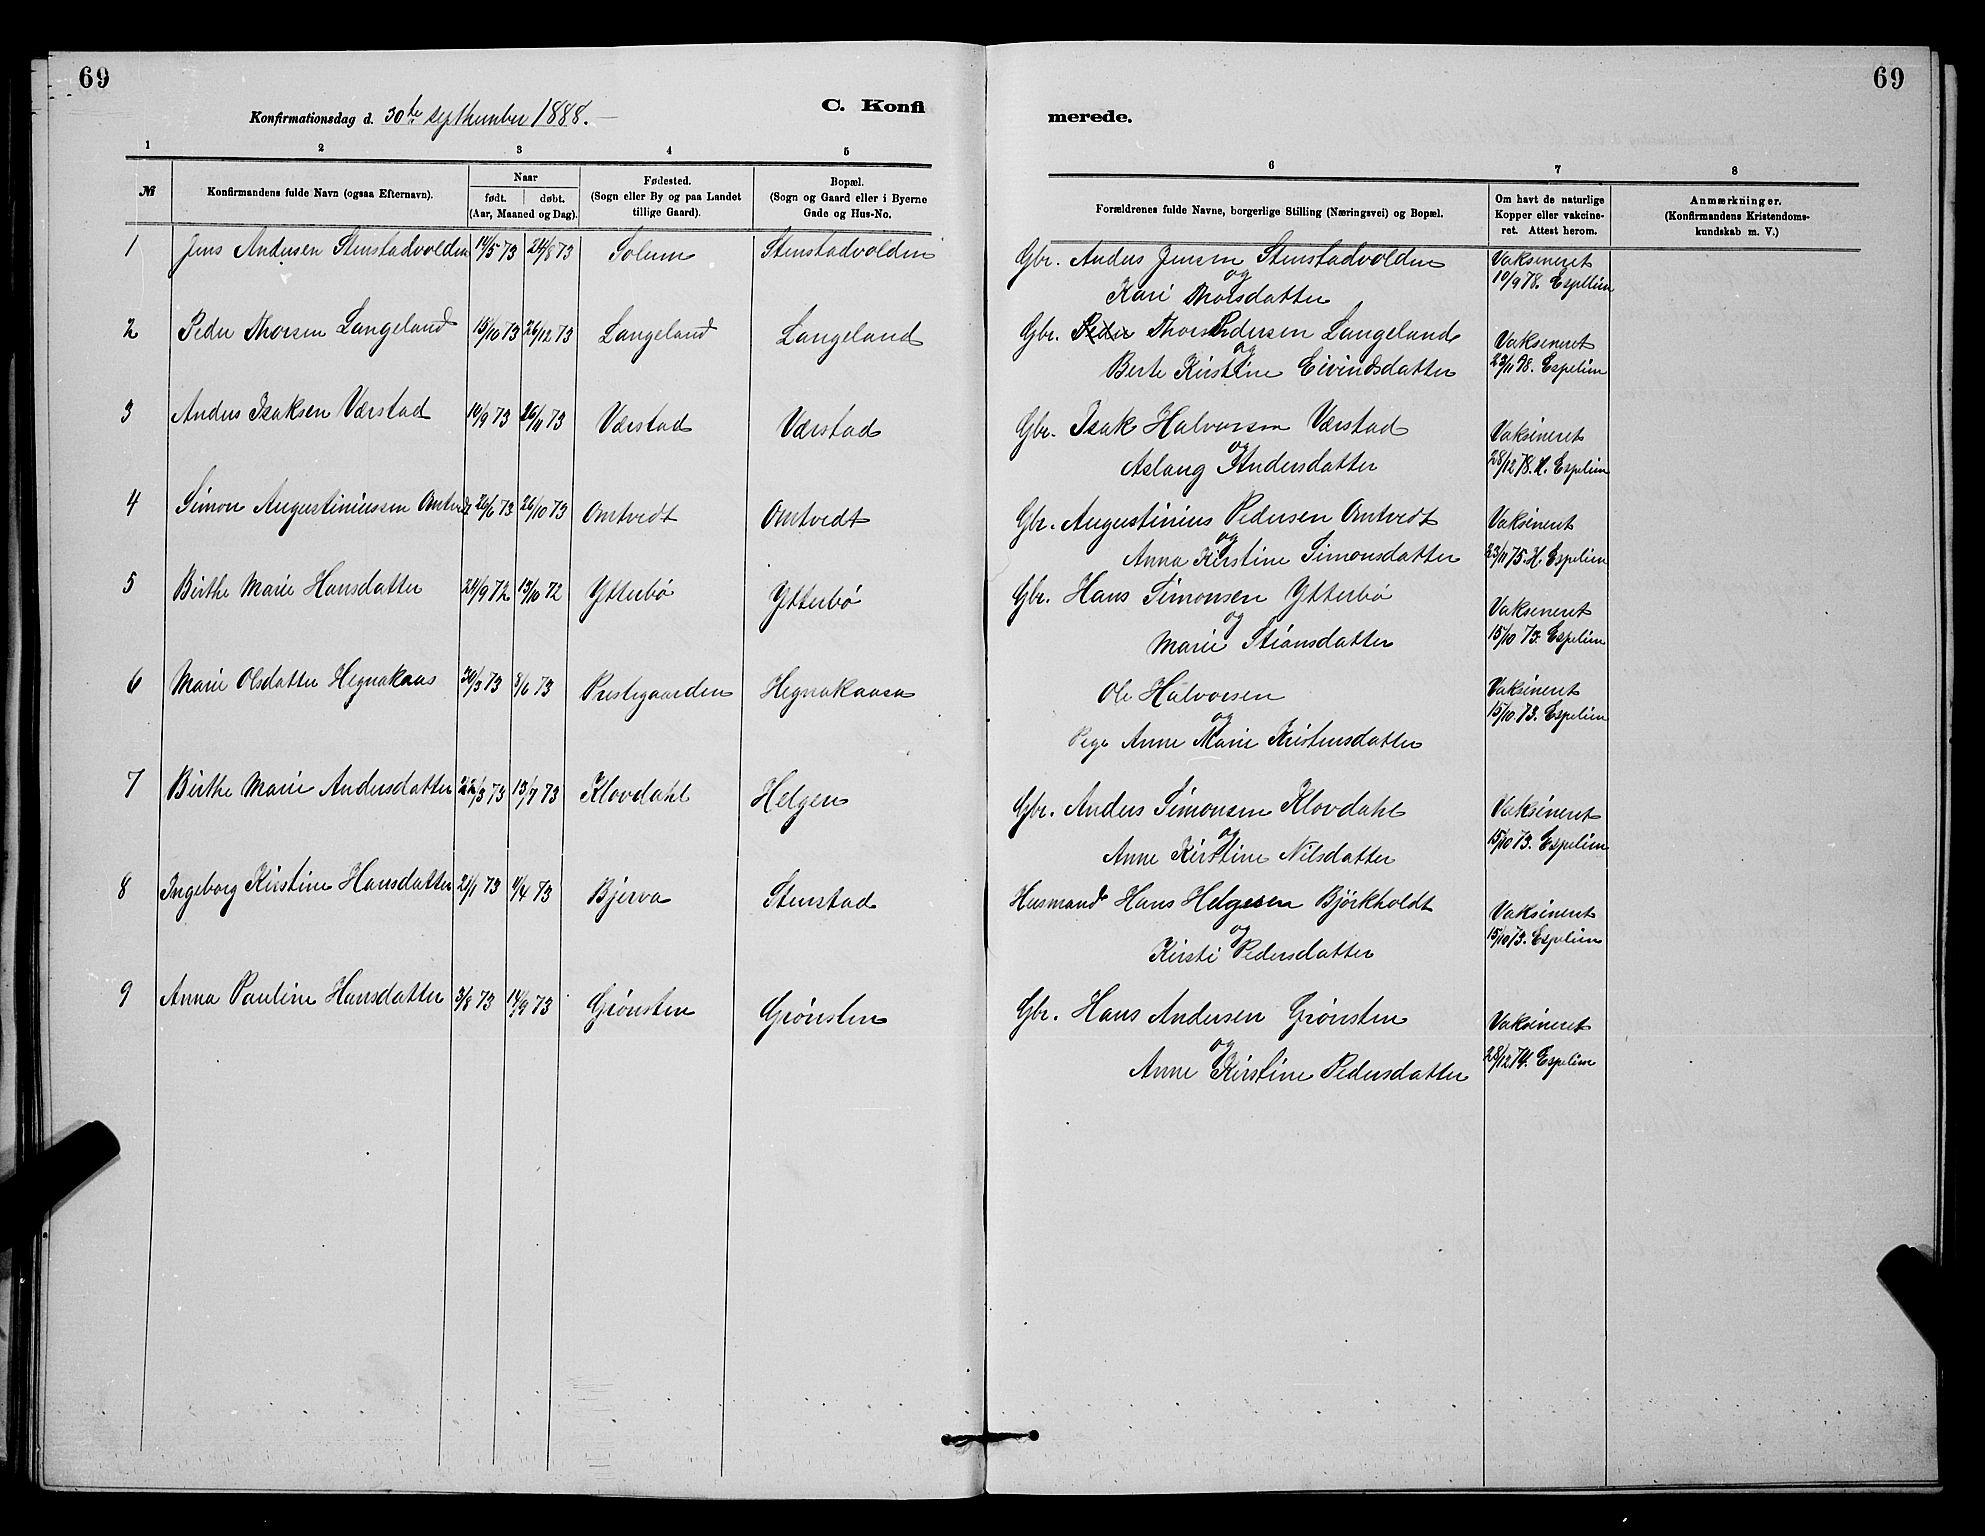 SAKO, Holla kirkebøker, G/Gb/L0001: Klokkerbok nr. II 1, 1882-1897, s. 69